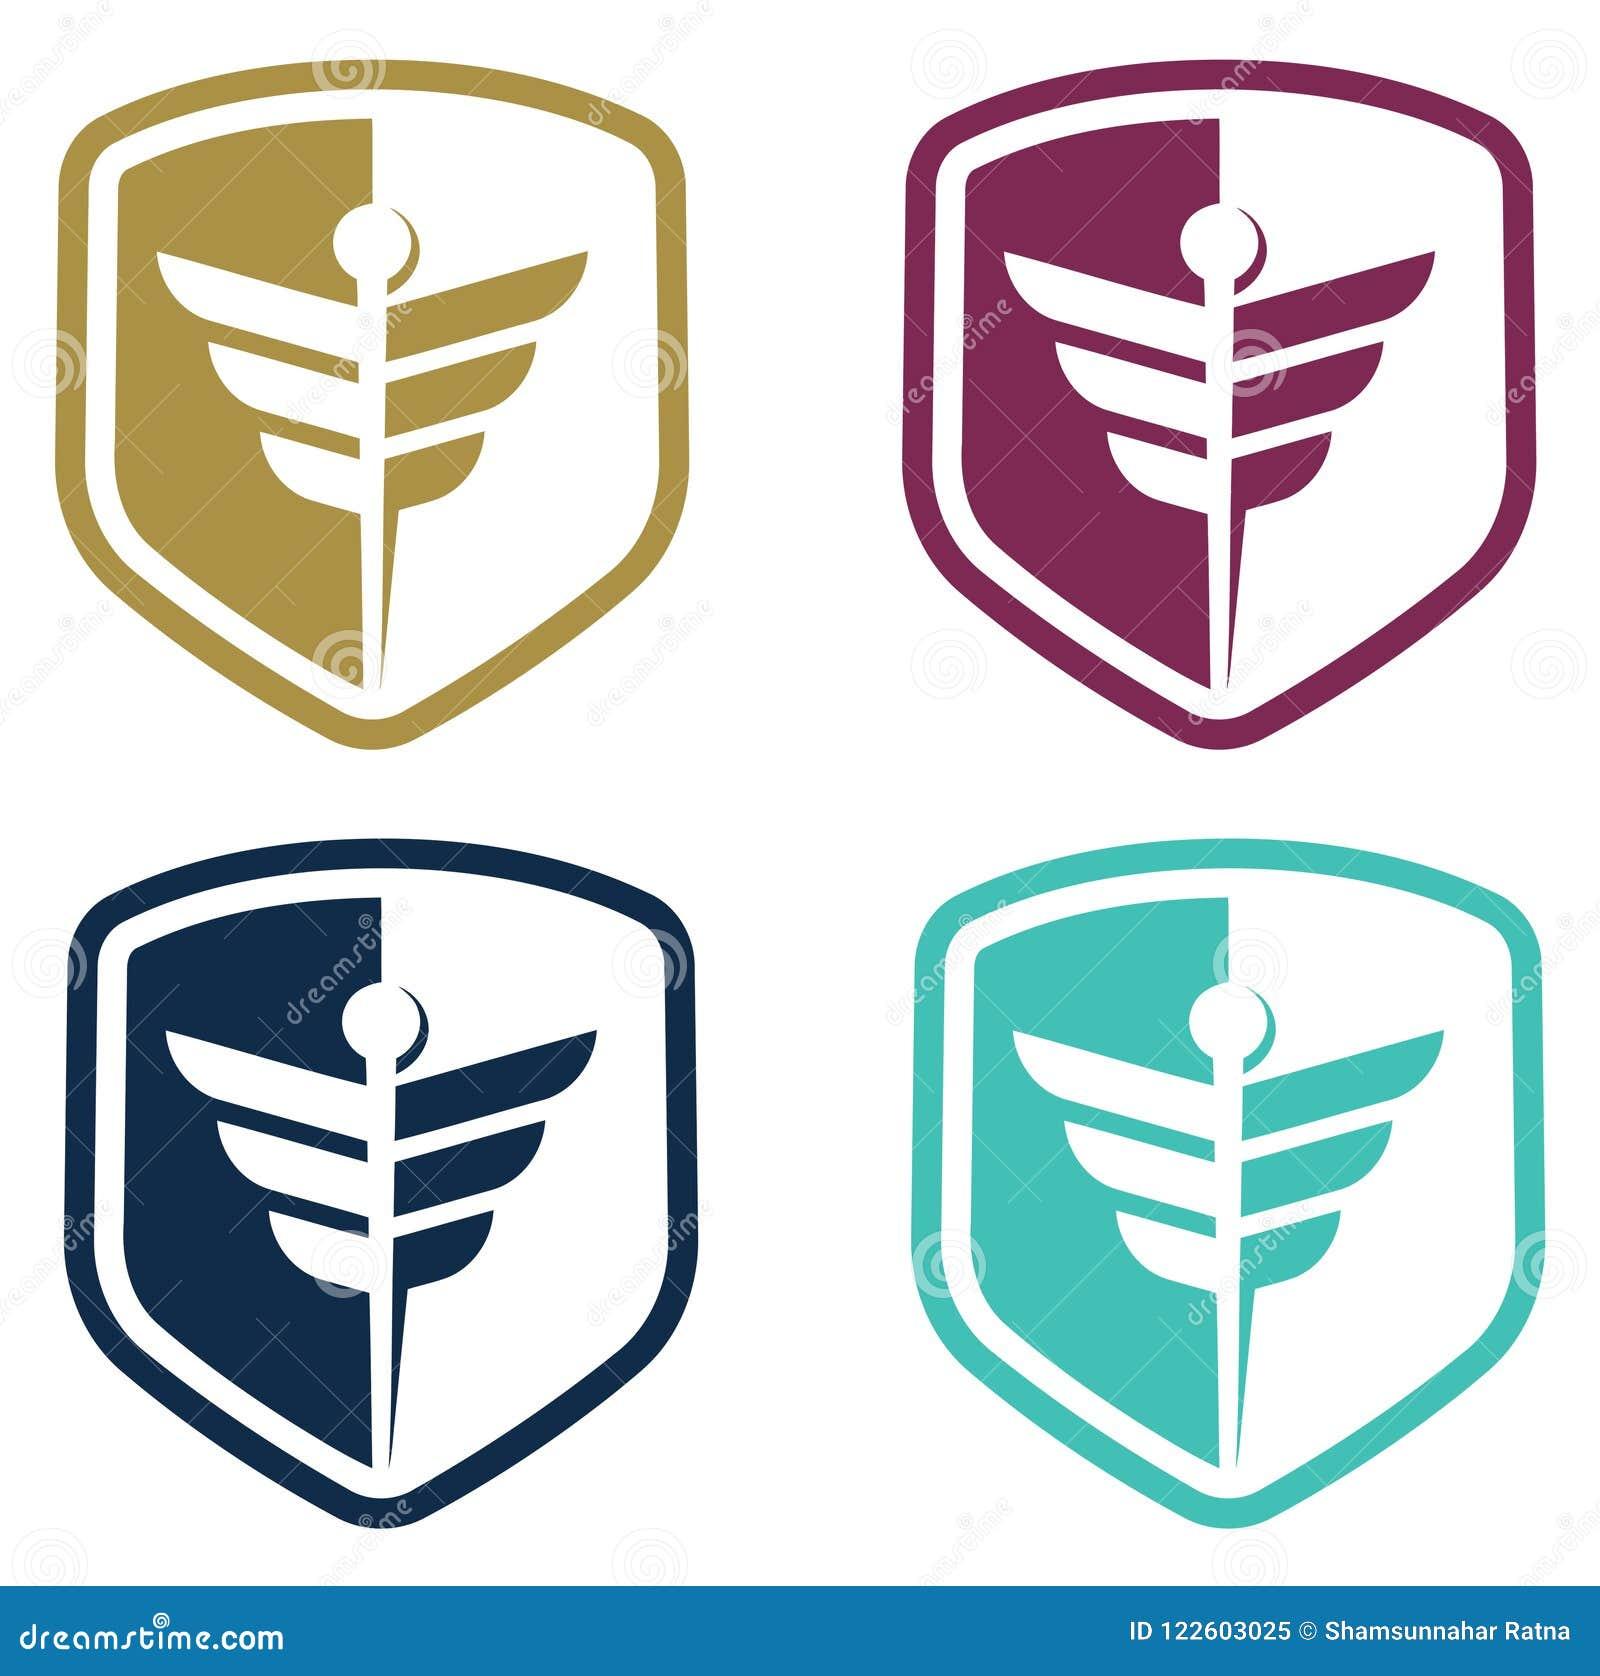 Best Business Logo Design App: Health And Wellness Logo Design Illustration Stock Vector rh:dreamstime.com,Design